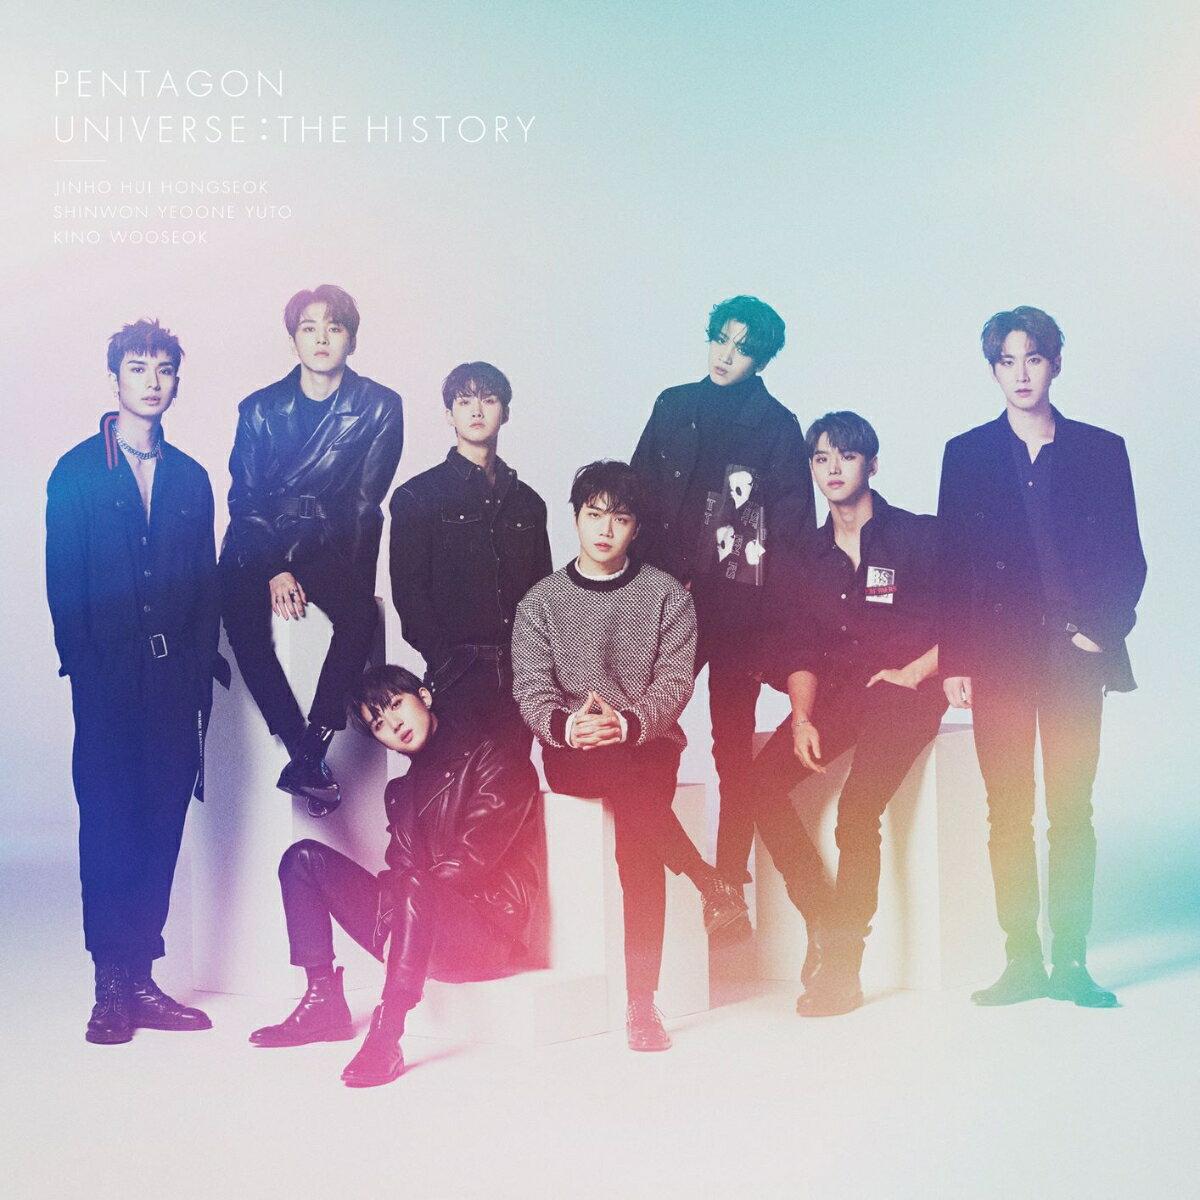 CD, 韓国(K-POP)・アジア UNIVERSE : THE HISTORY (B CDPhotobook)( (1)) PENTAGON